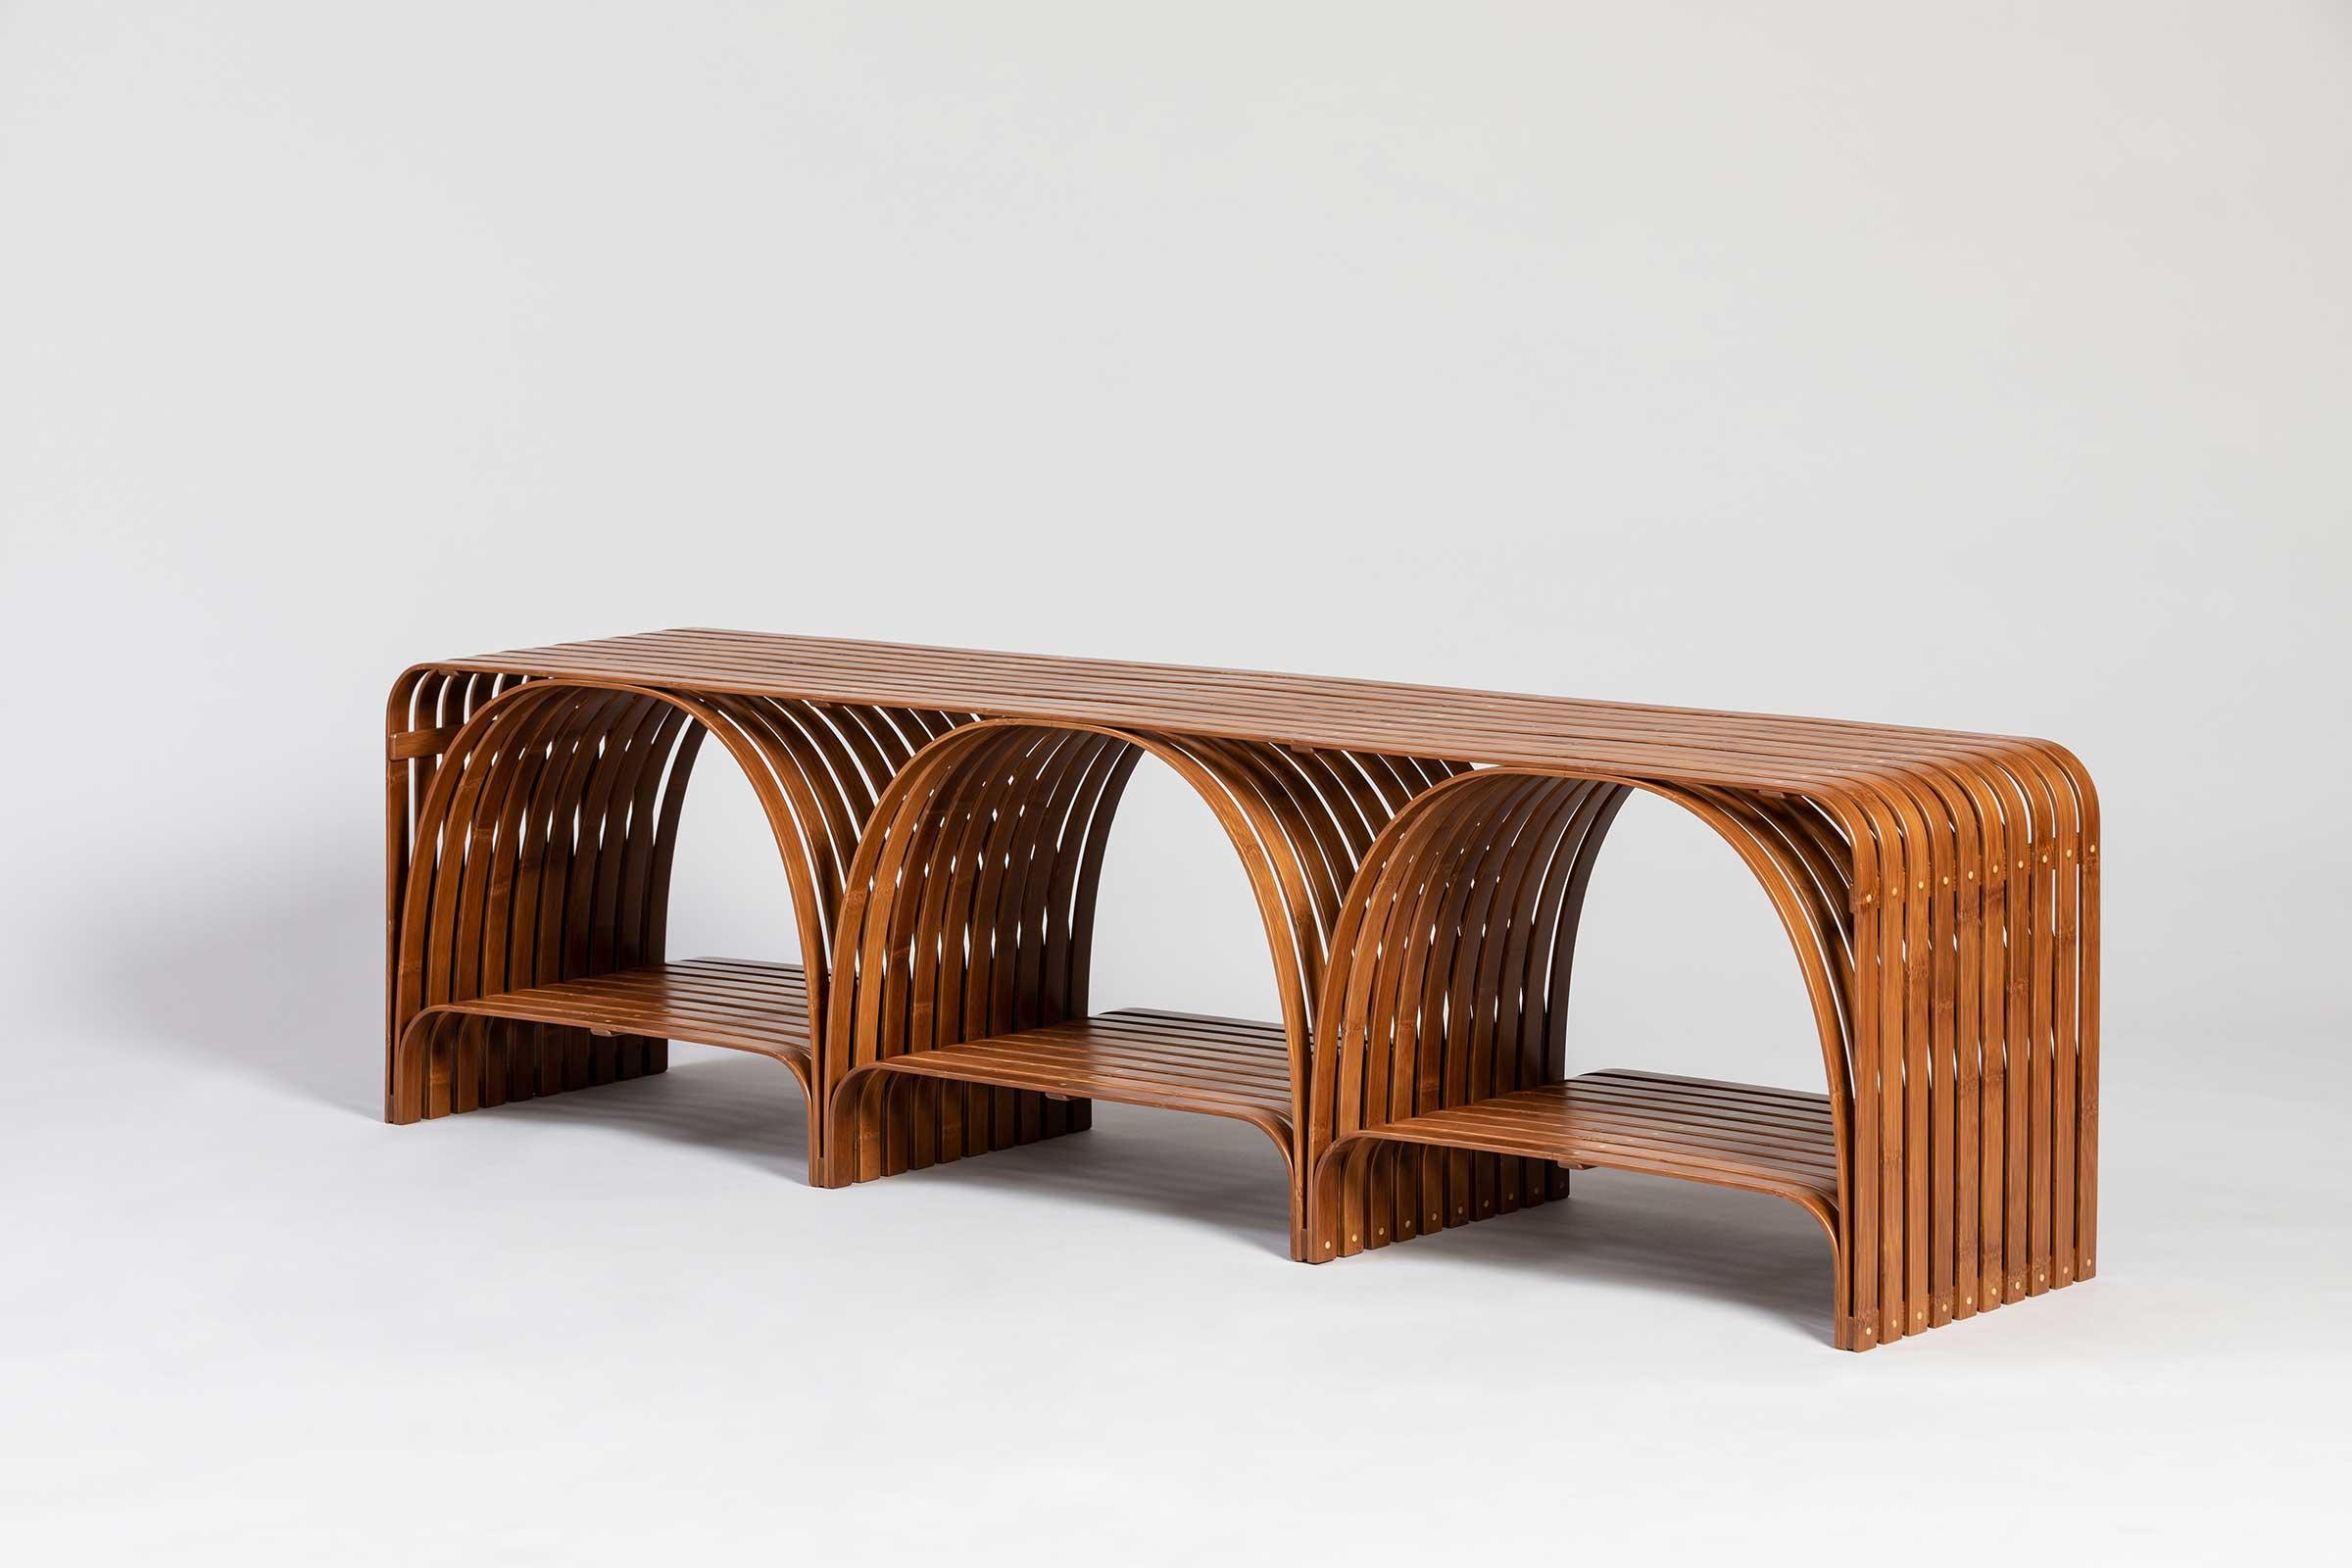 Sebastian Hercher — The Bridge Bamboo Bench